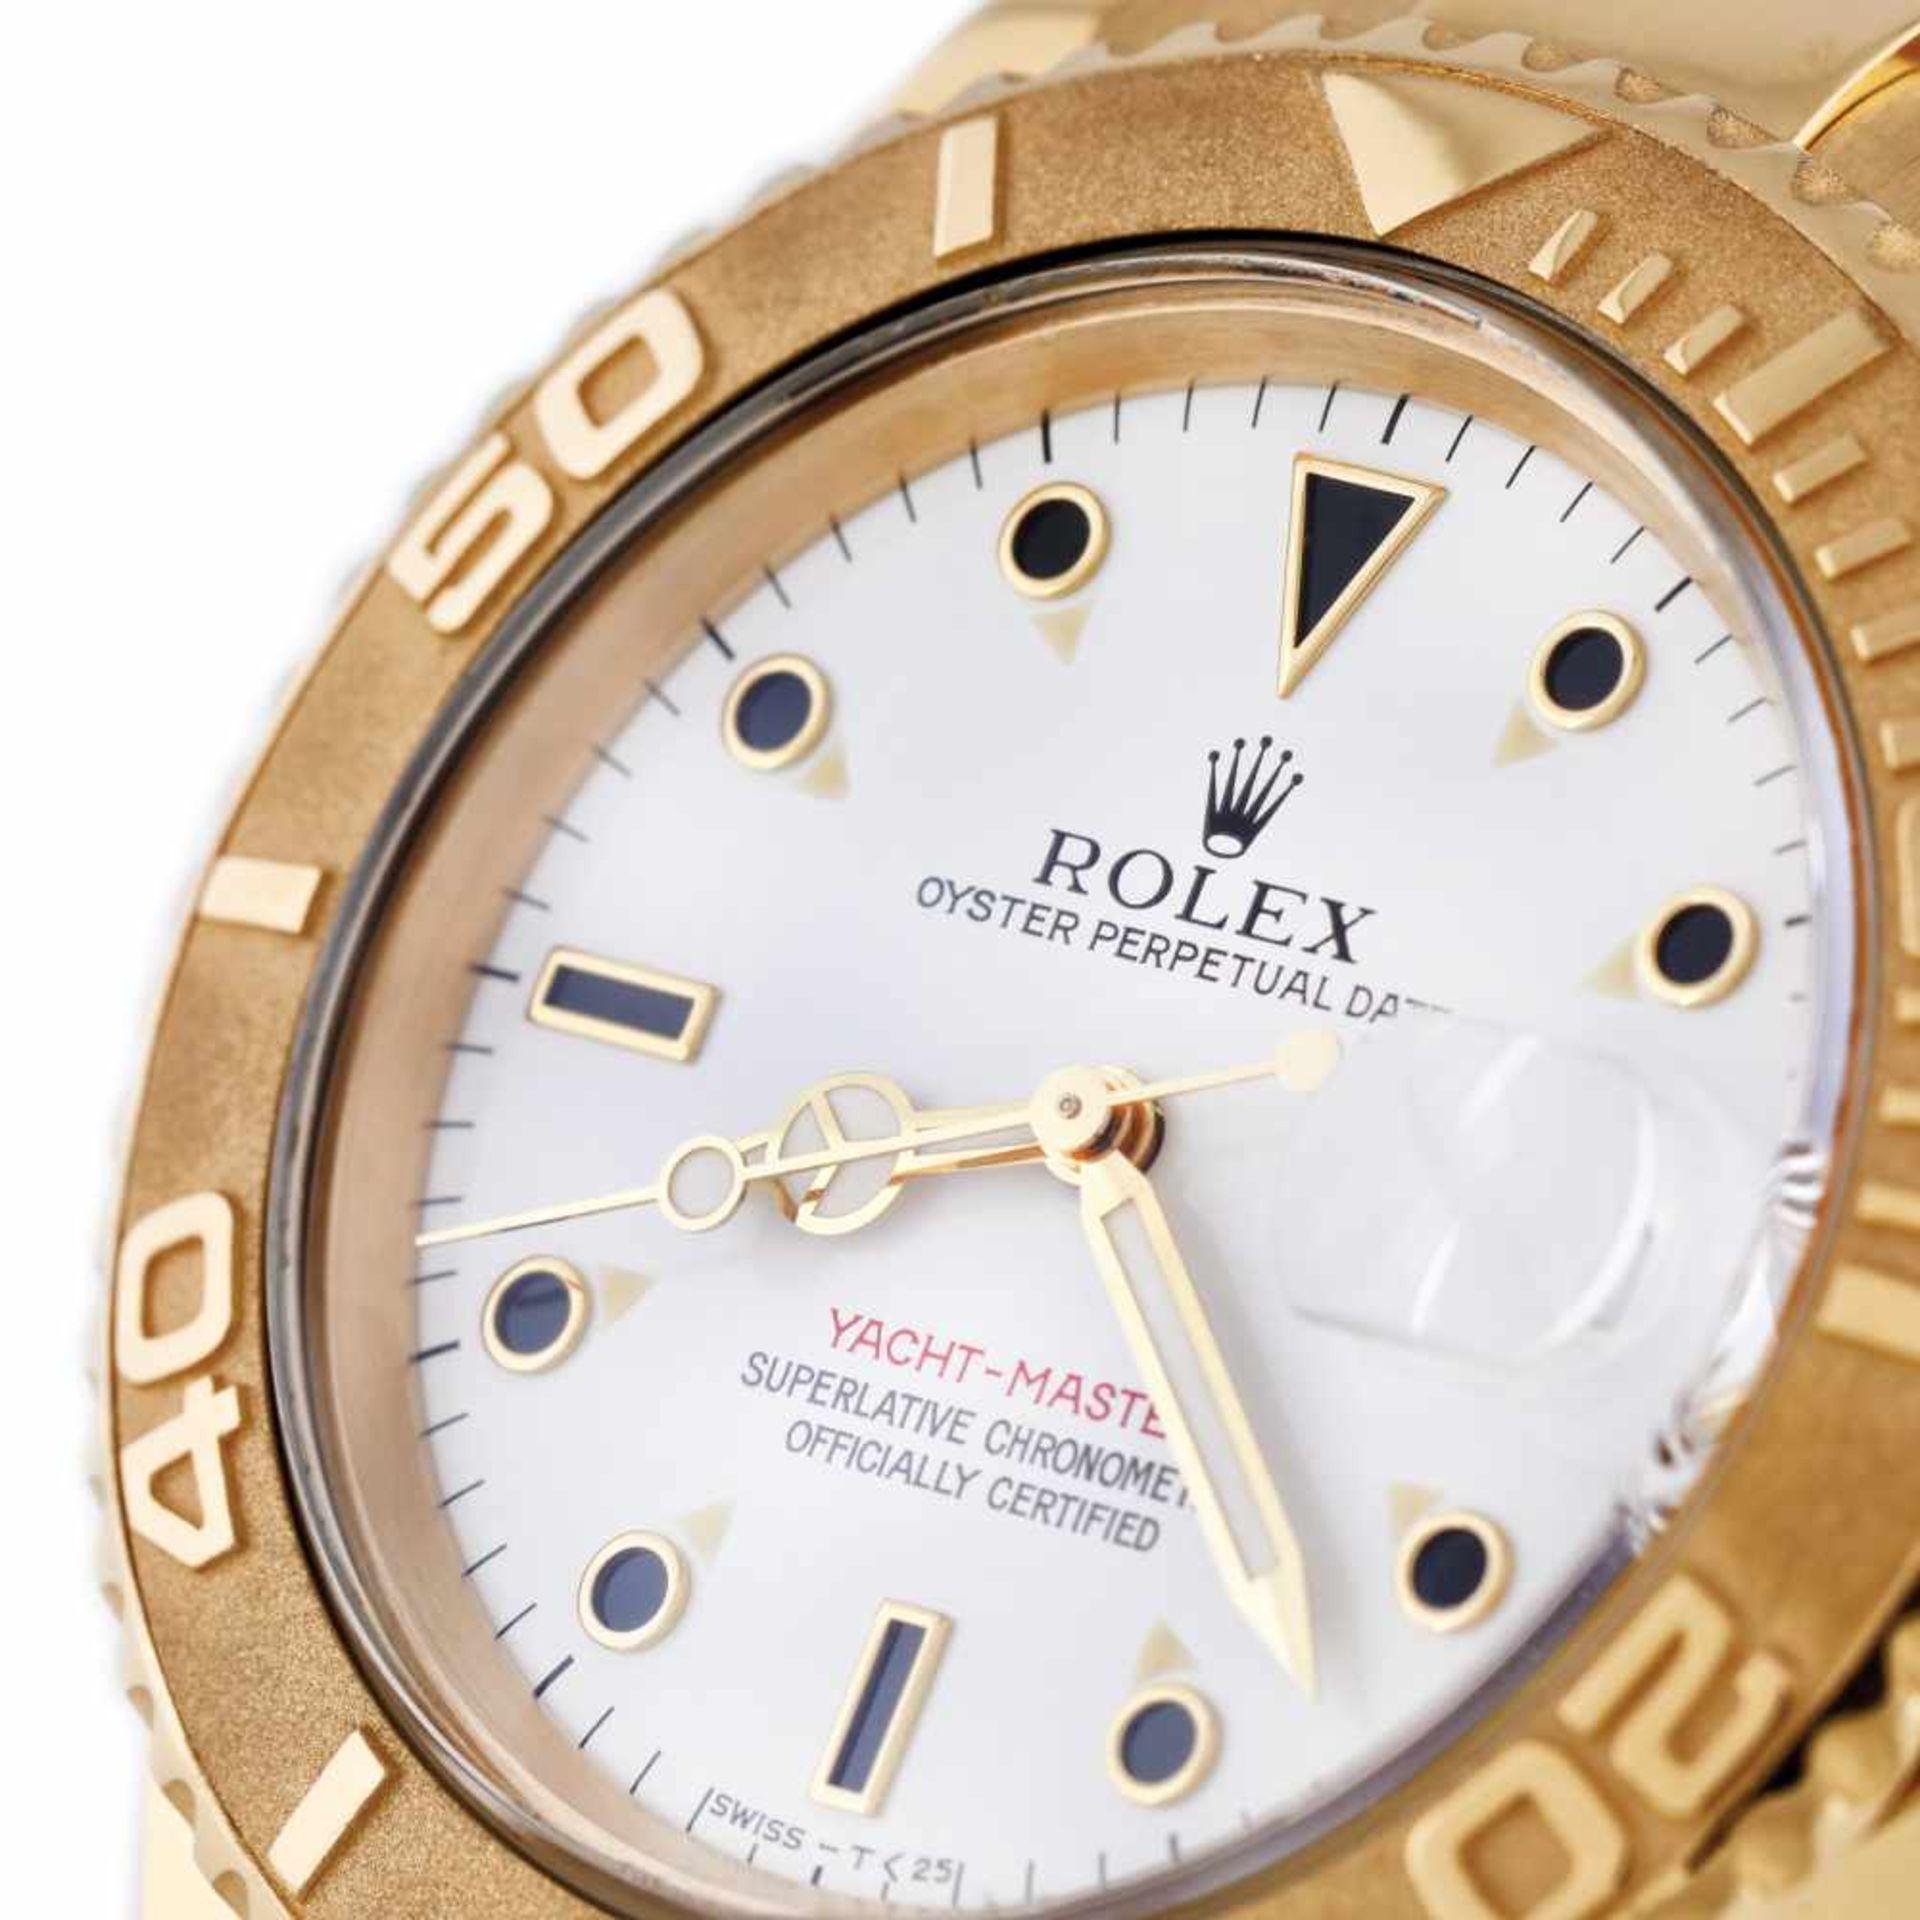 Rolex Yacht Master wristwatch, gold, men, instruction manual and original box - Bild 6 aus 6